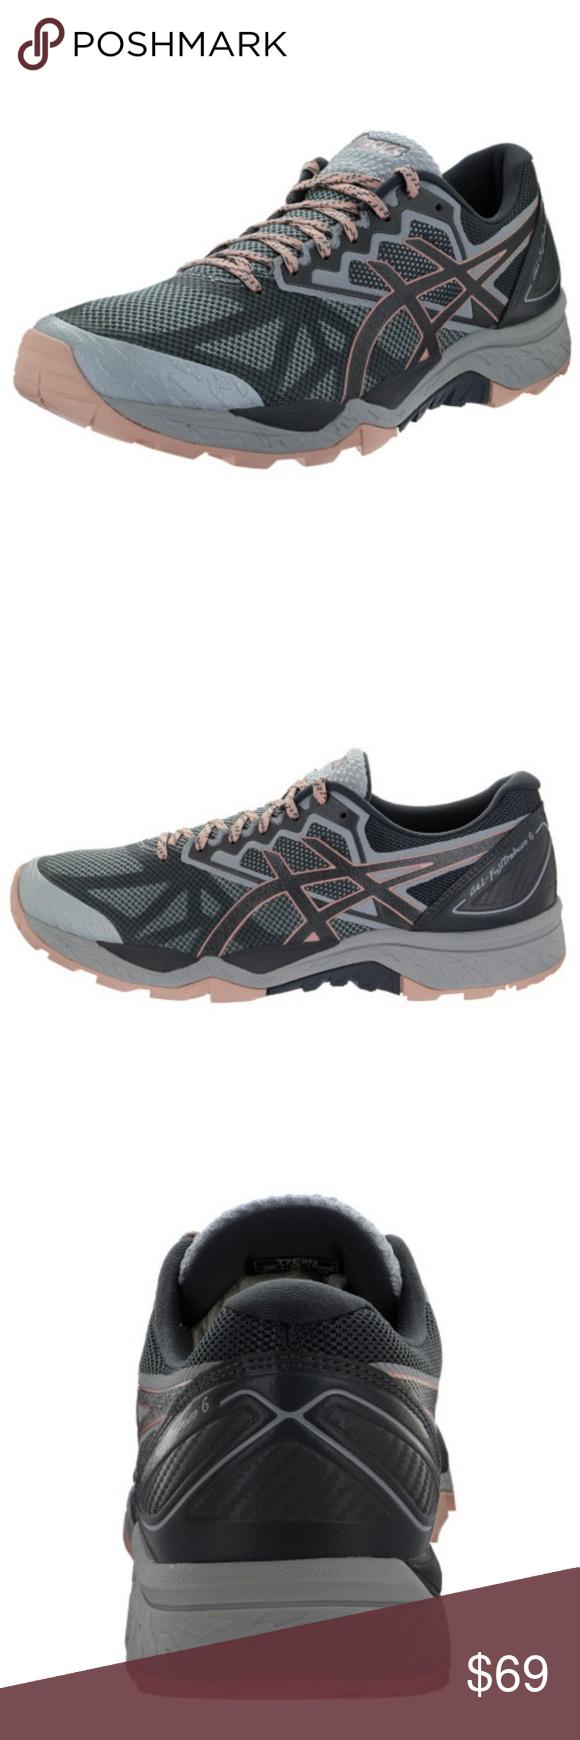 Grey ASICS GEL-Fujitrabuco 6  Athletic Running Trail Shoes Womens